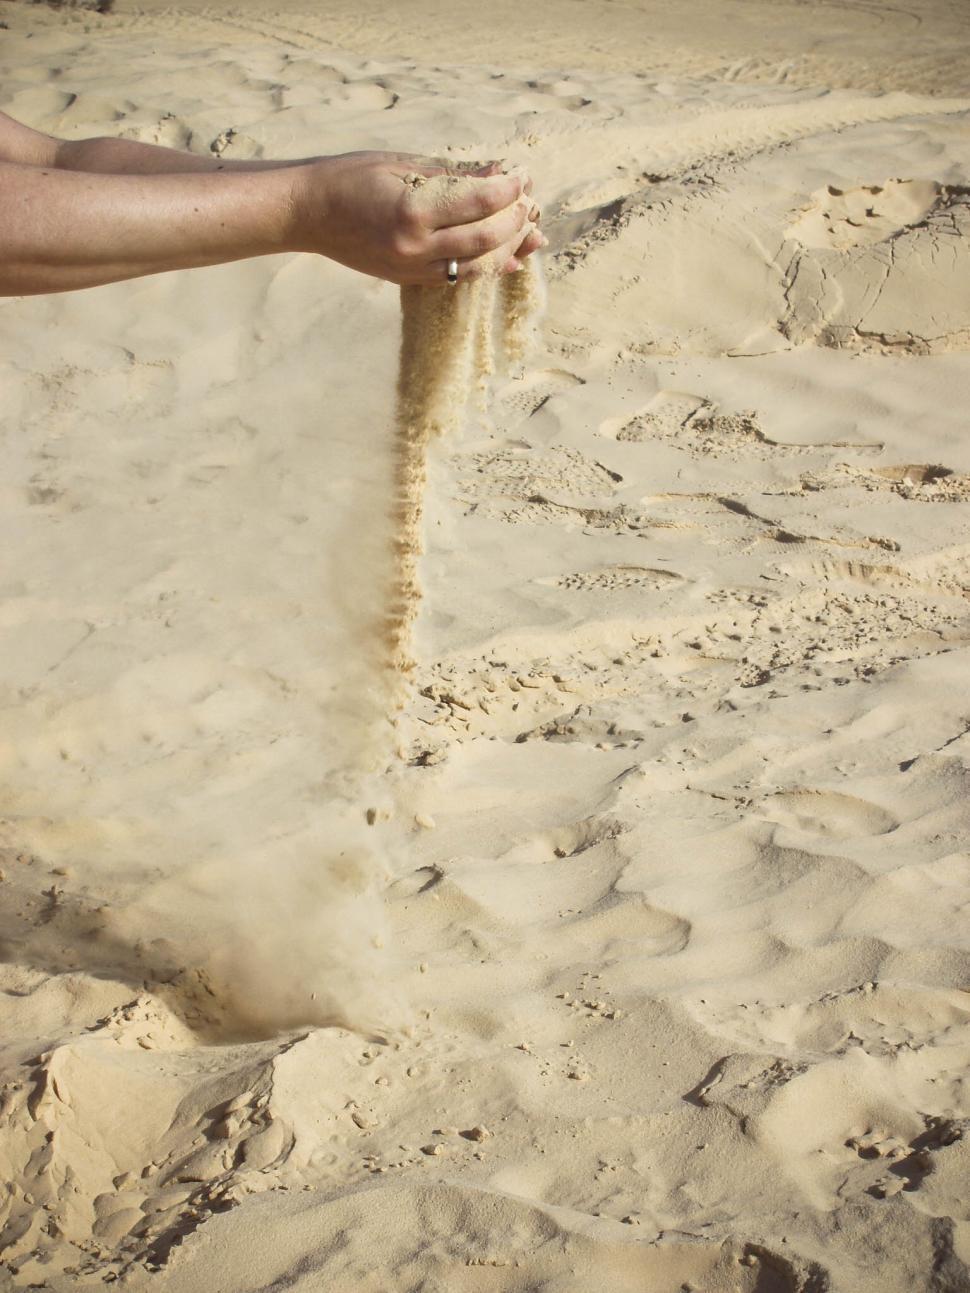 Download Free Stock Photo of Desert sand